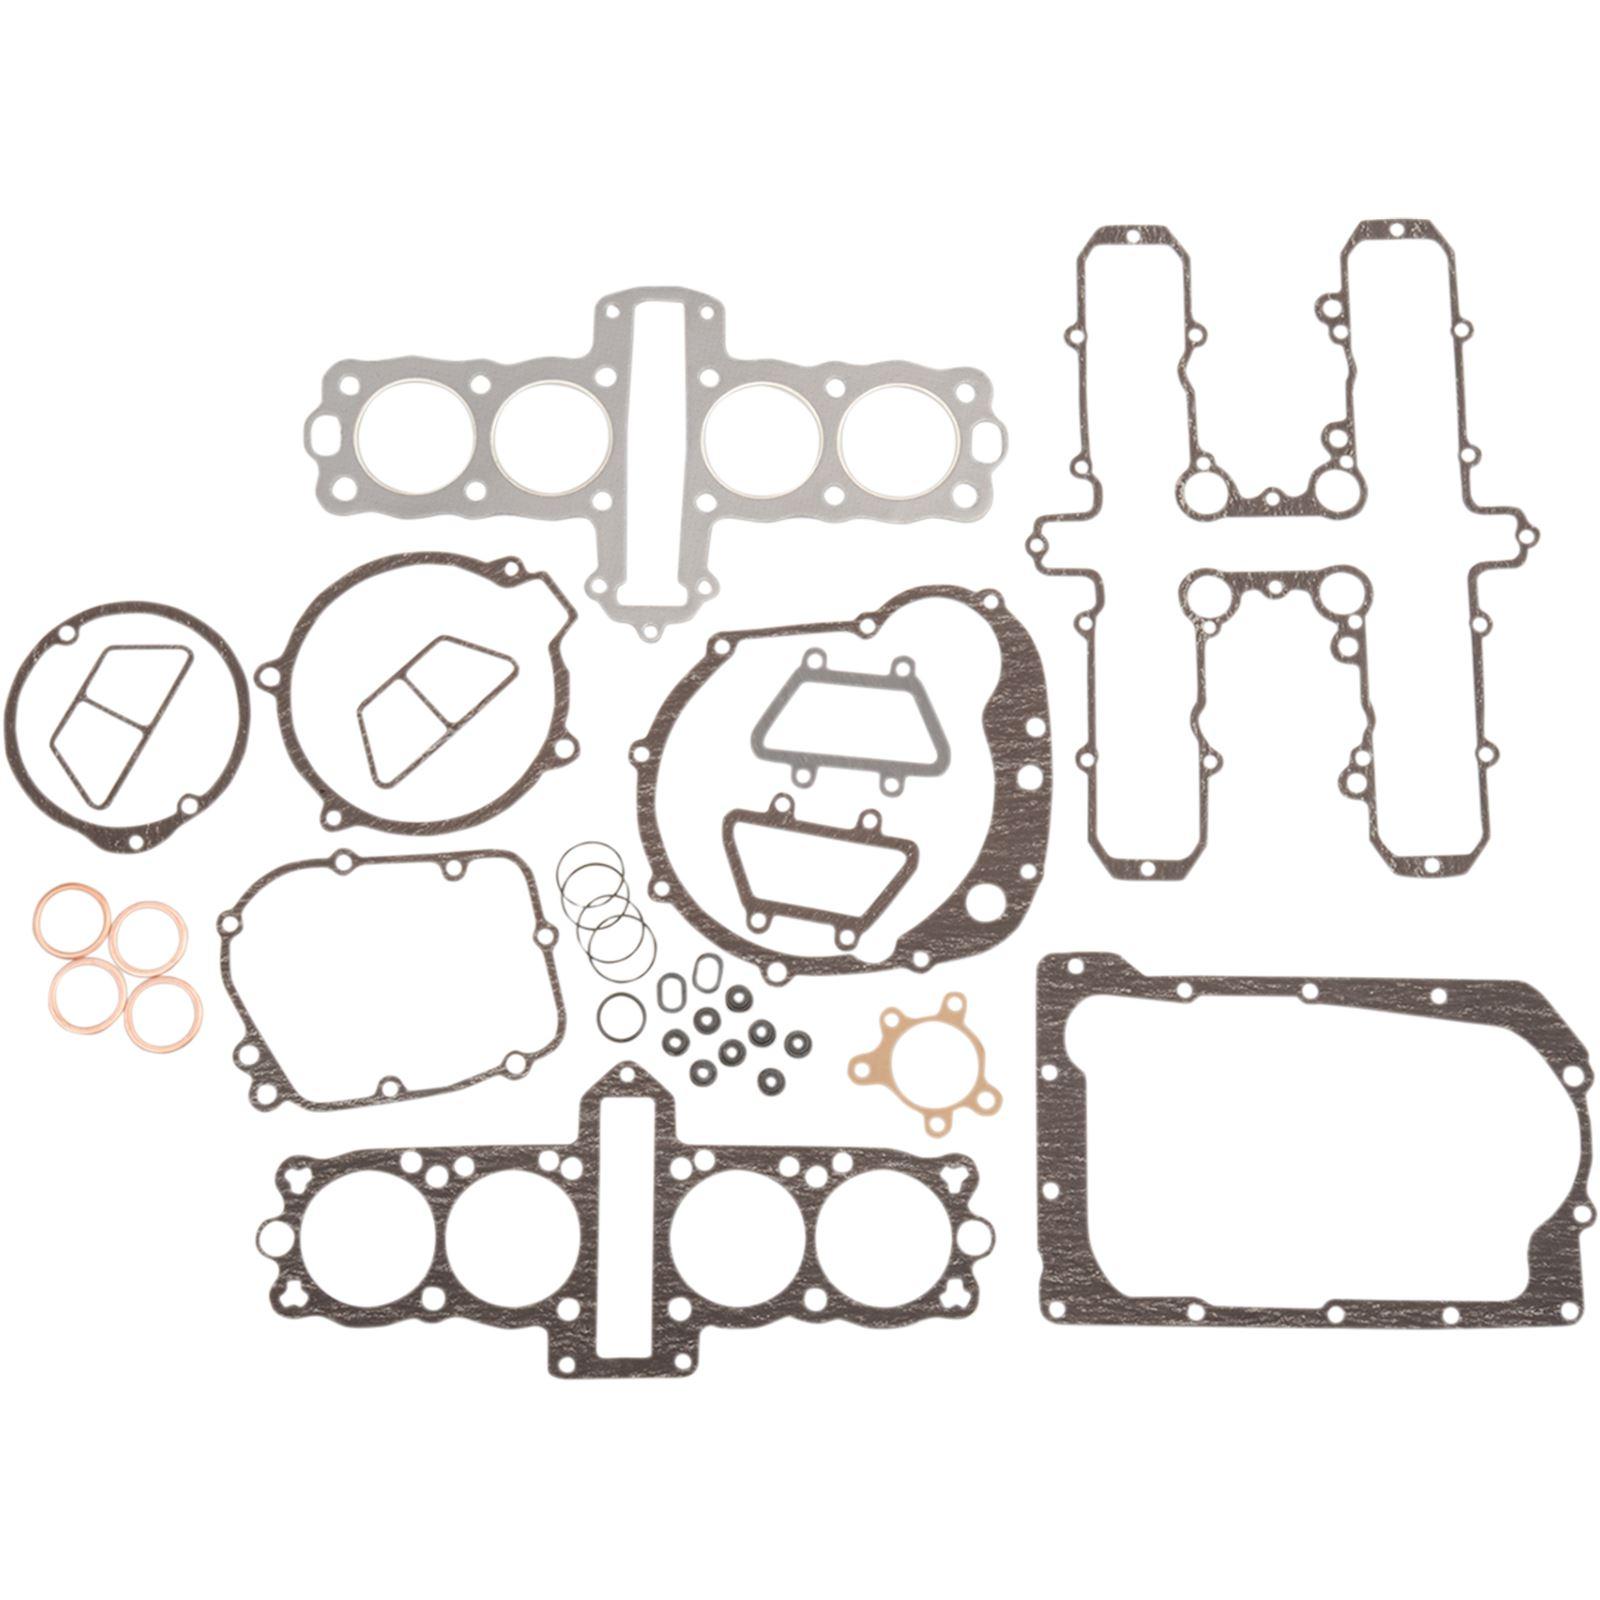 Vesrah Complete Gasket Kit KZ/ZX550